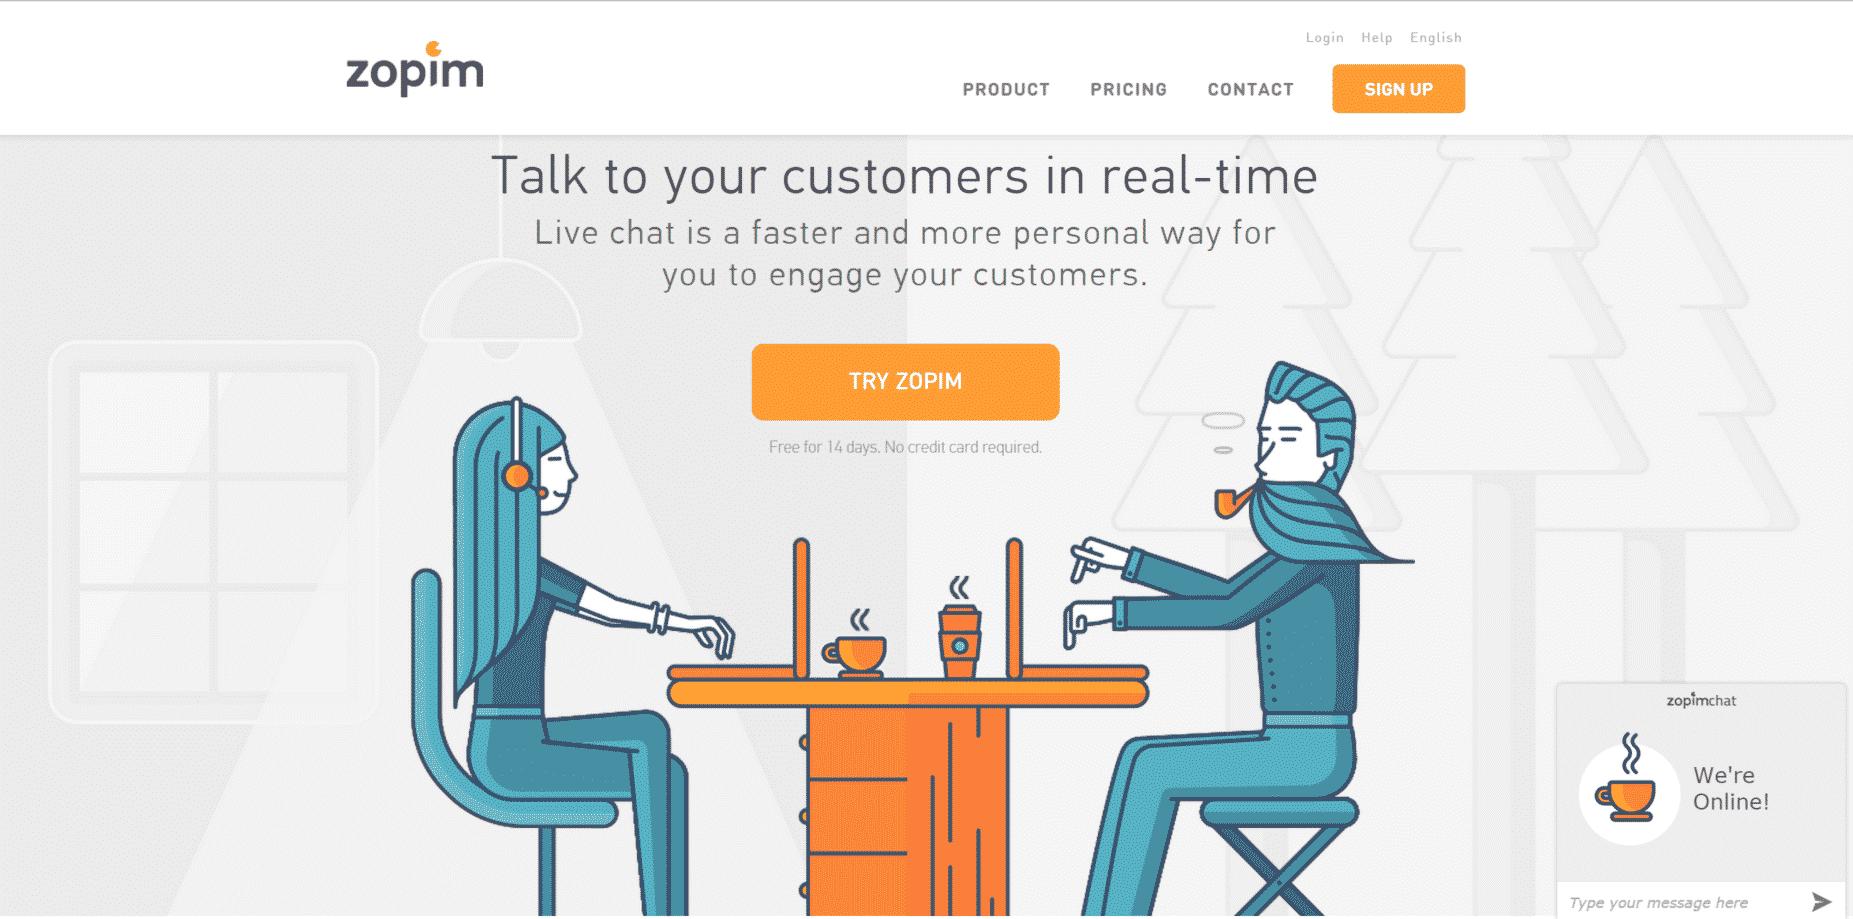 Zopim Live Chat บนเว็บ ออนไลน์มีประโยชน์อย่างไร